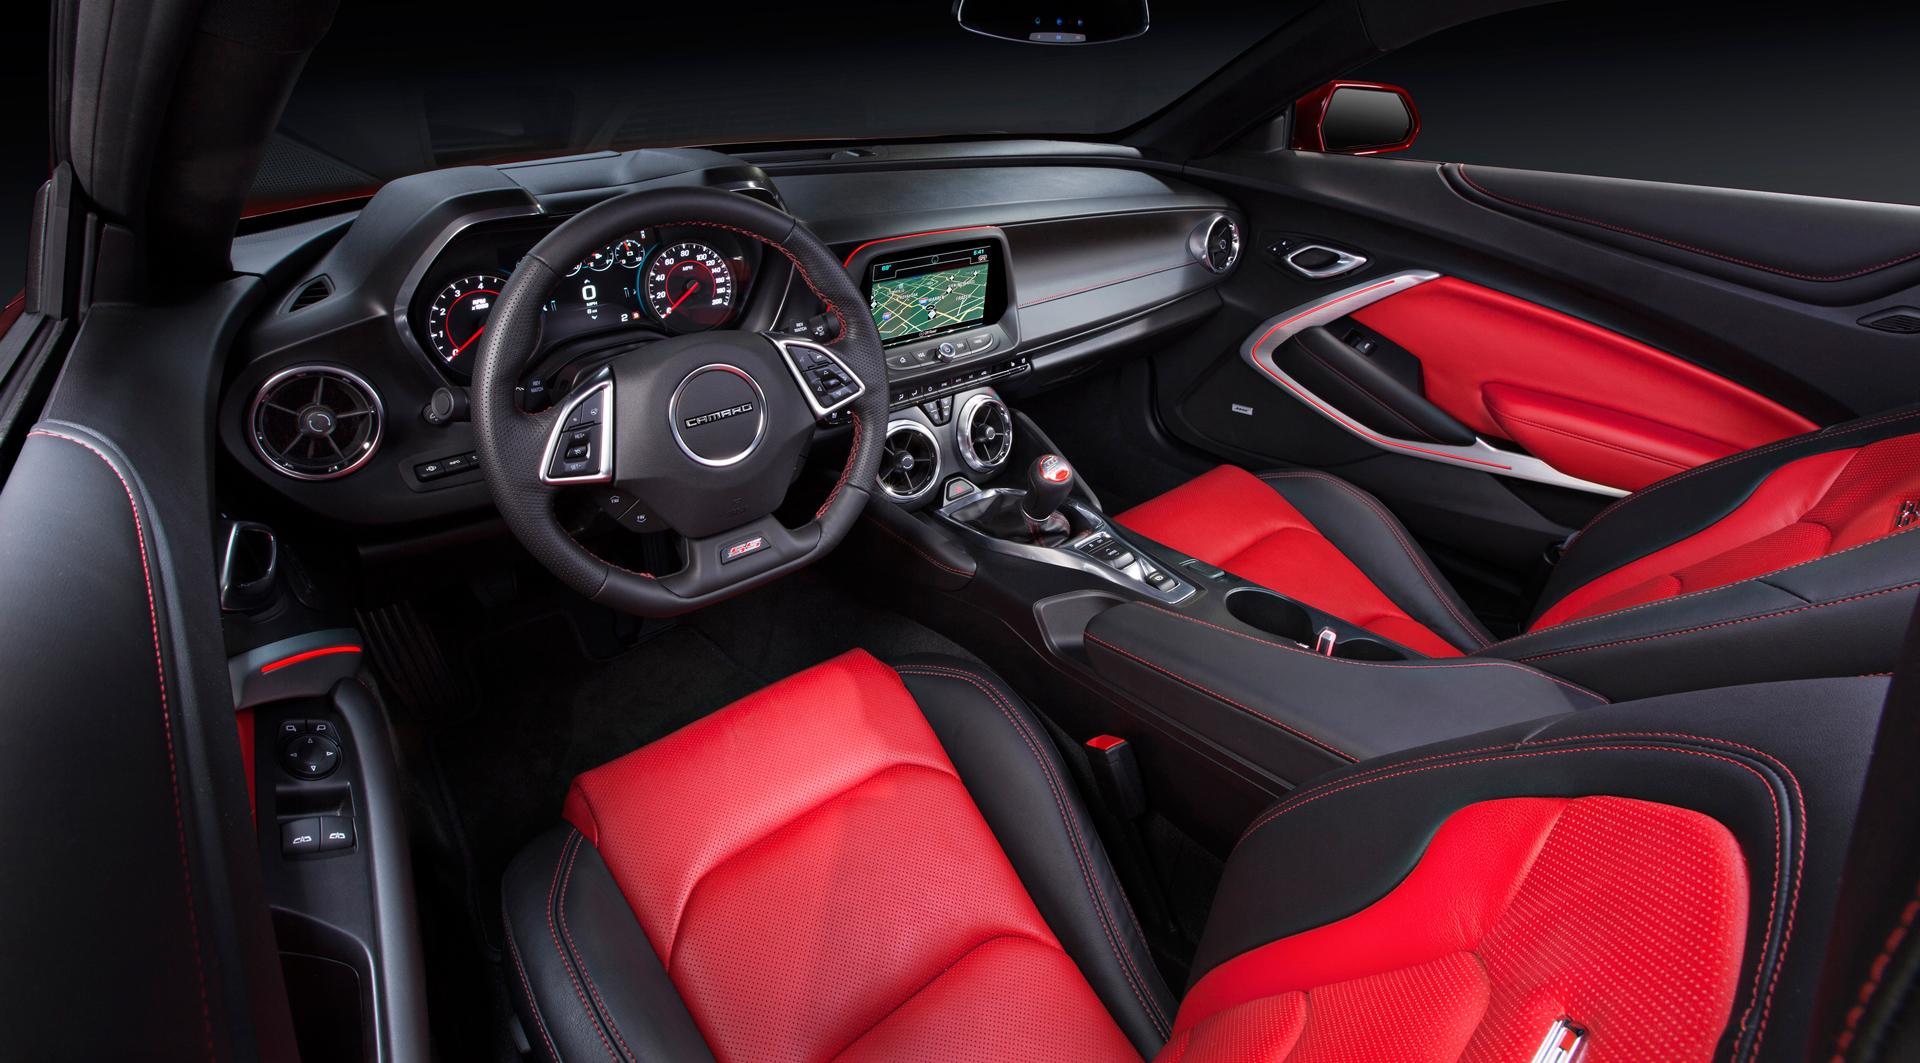 Chevrolet 2016 Camaro SS - intérieur / interior